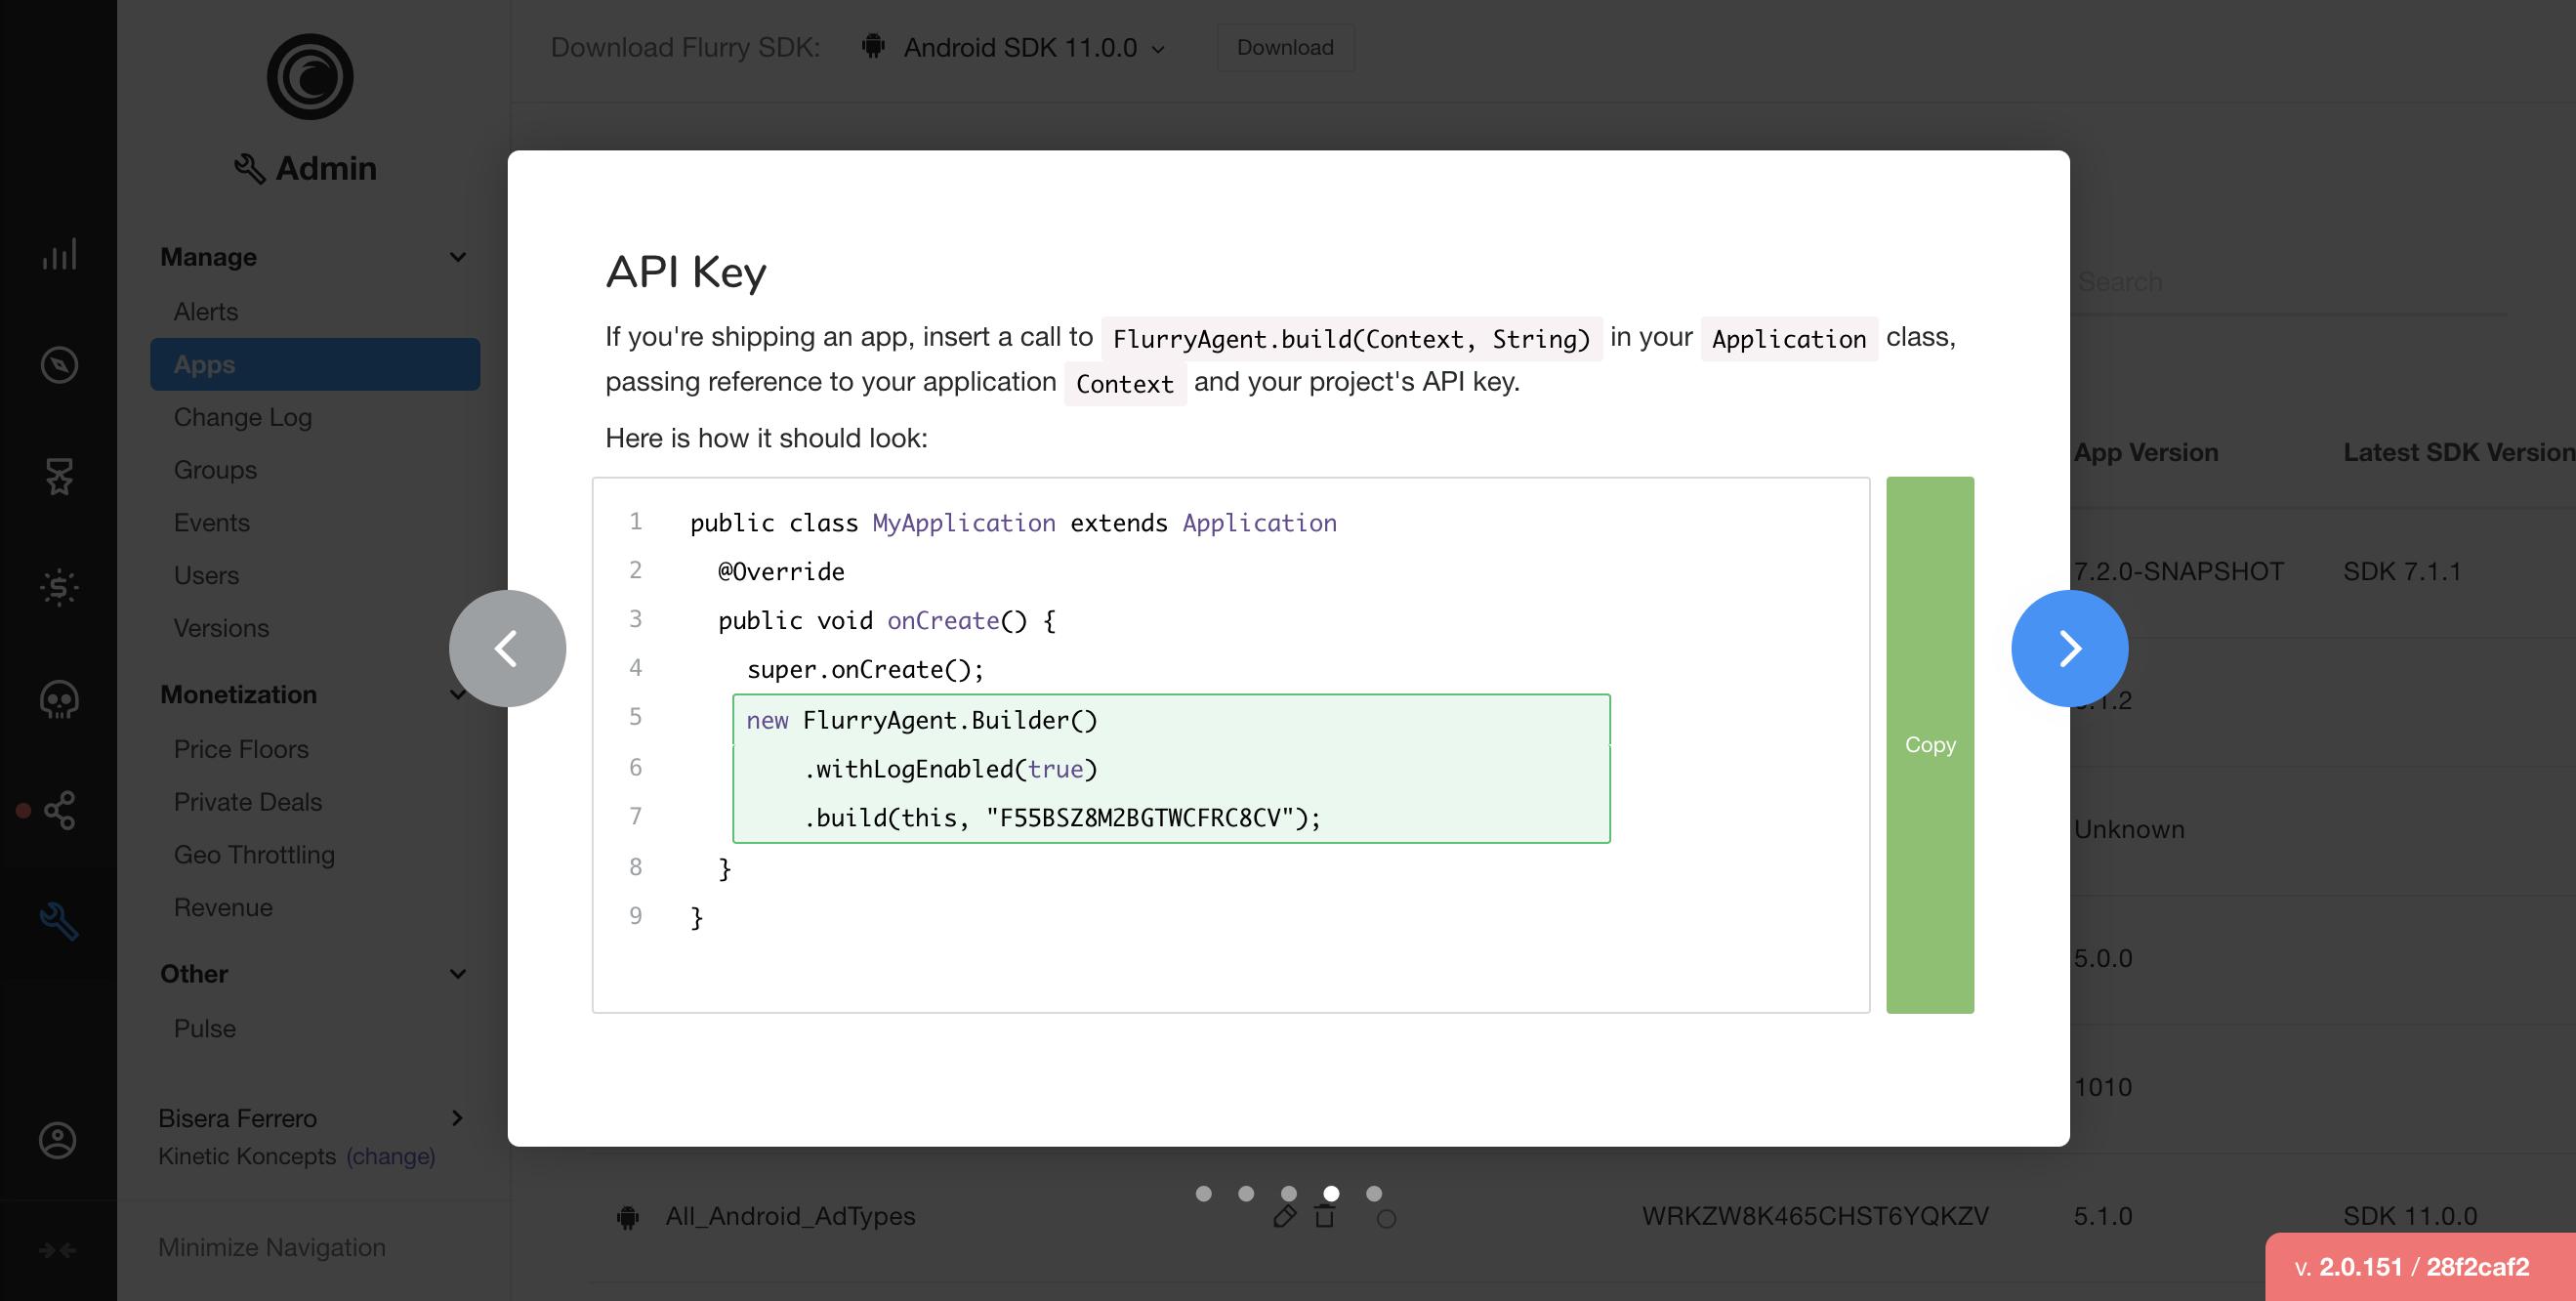 api_key_given